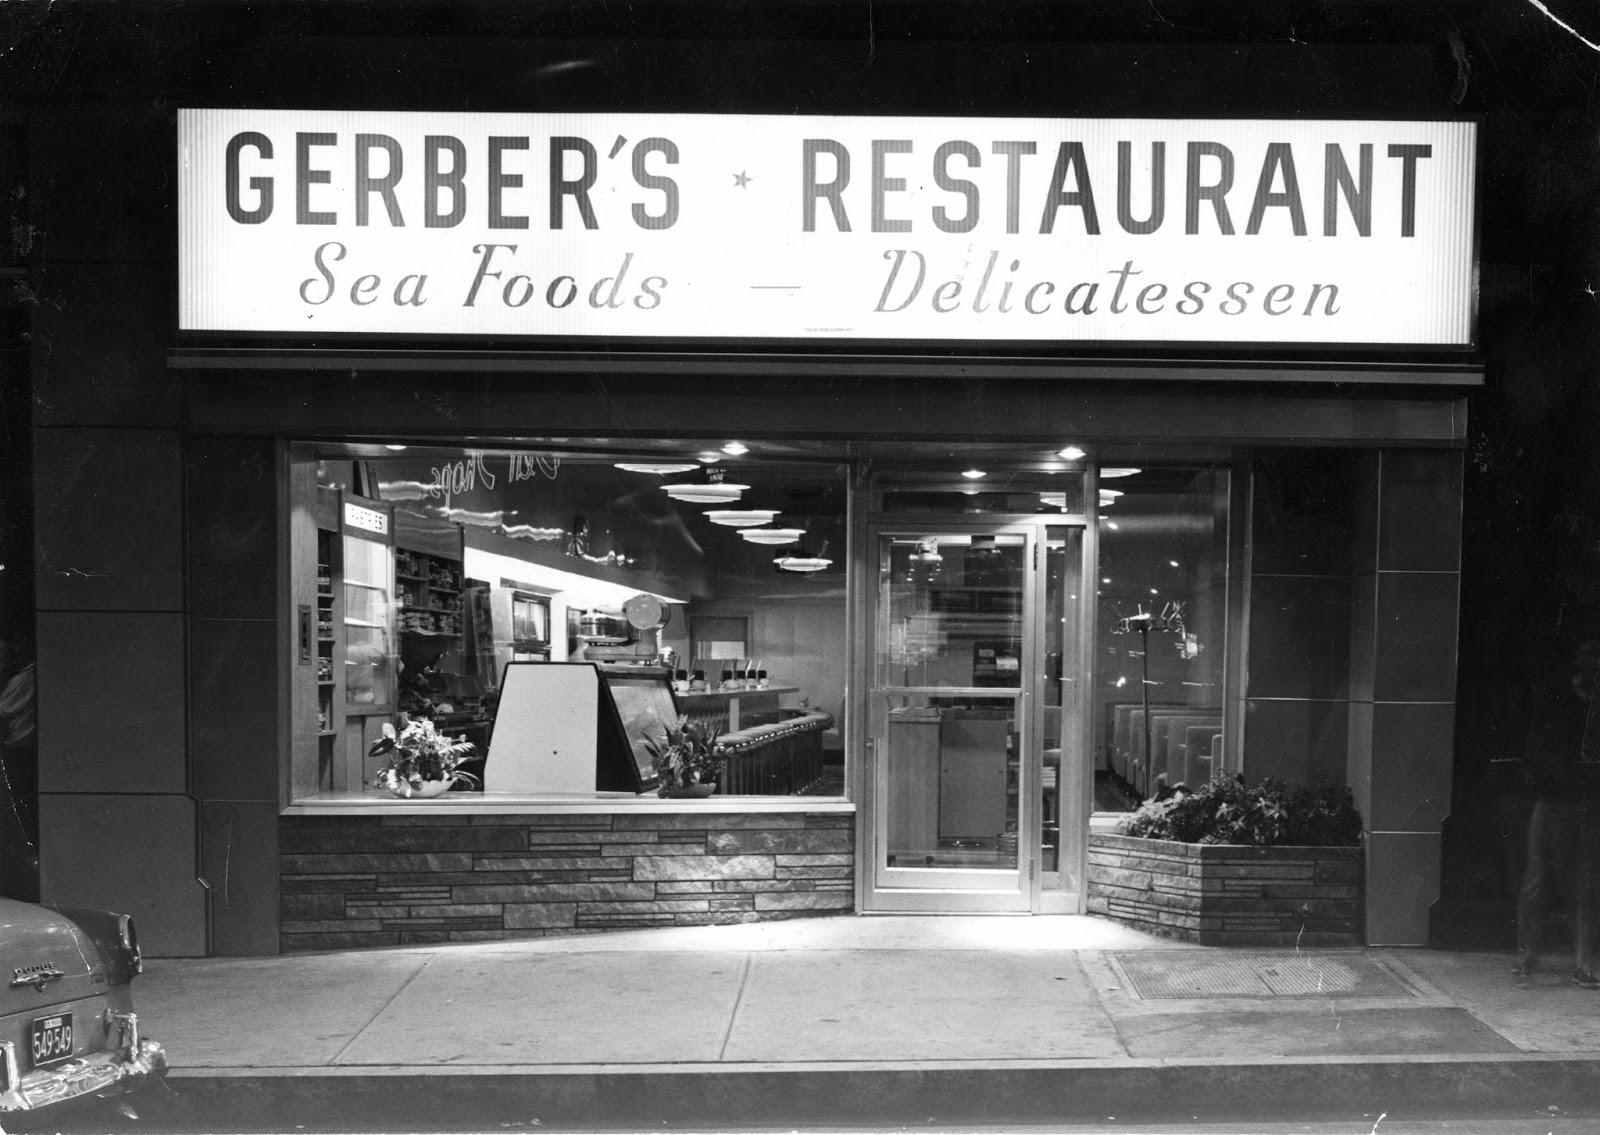 History by the Sea | Salem, Massachusetts: Gerber's